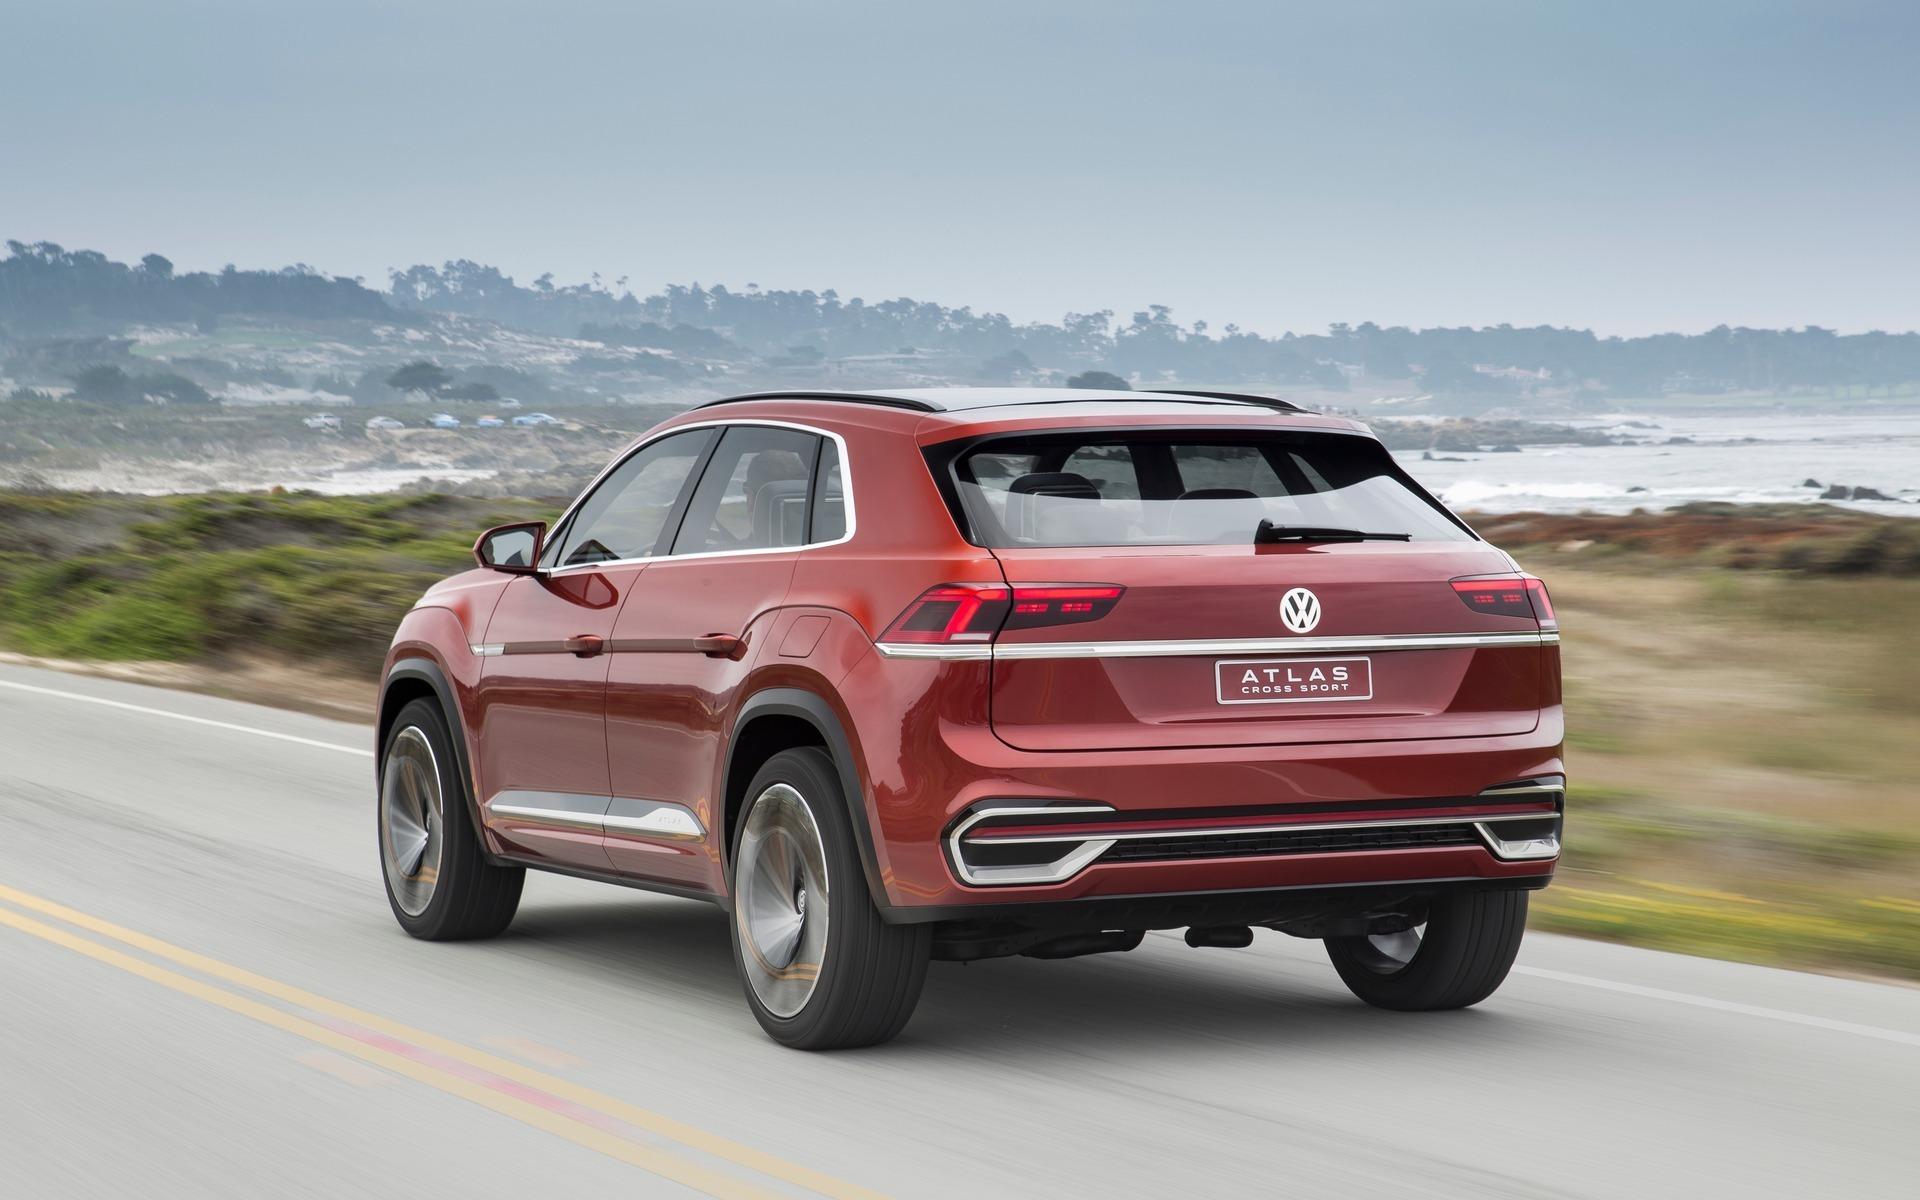 Volkswagen confirme le nom de son prochain VUS : Atlas Cross Sport 358508_Volkswagen_confirme_le_nom_de_son_prochain_VUS